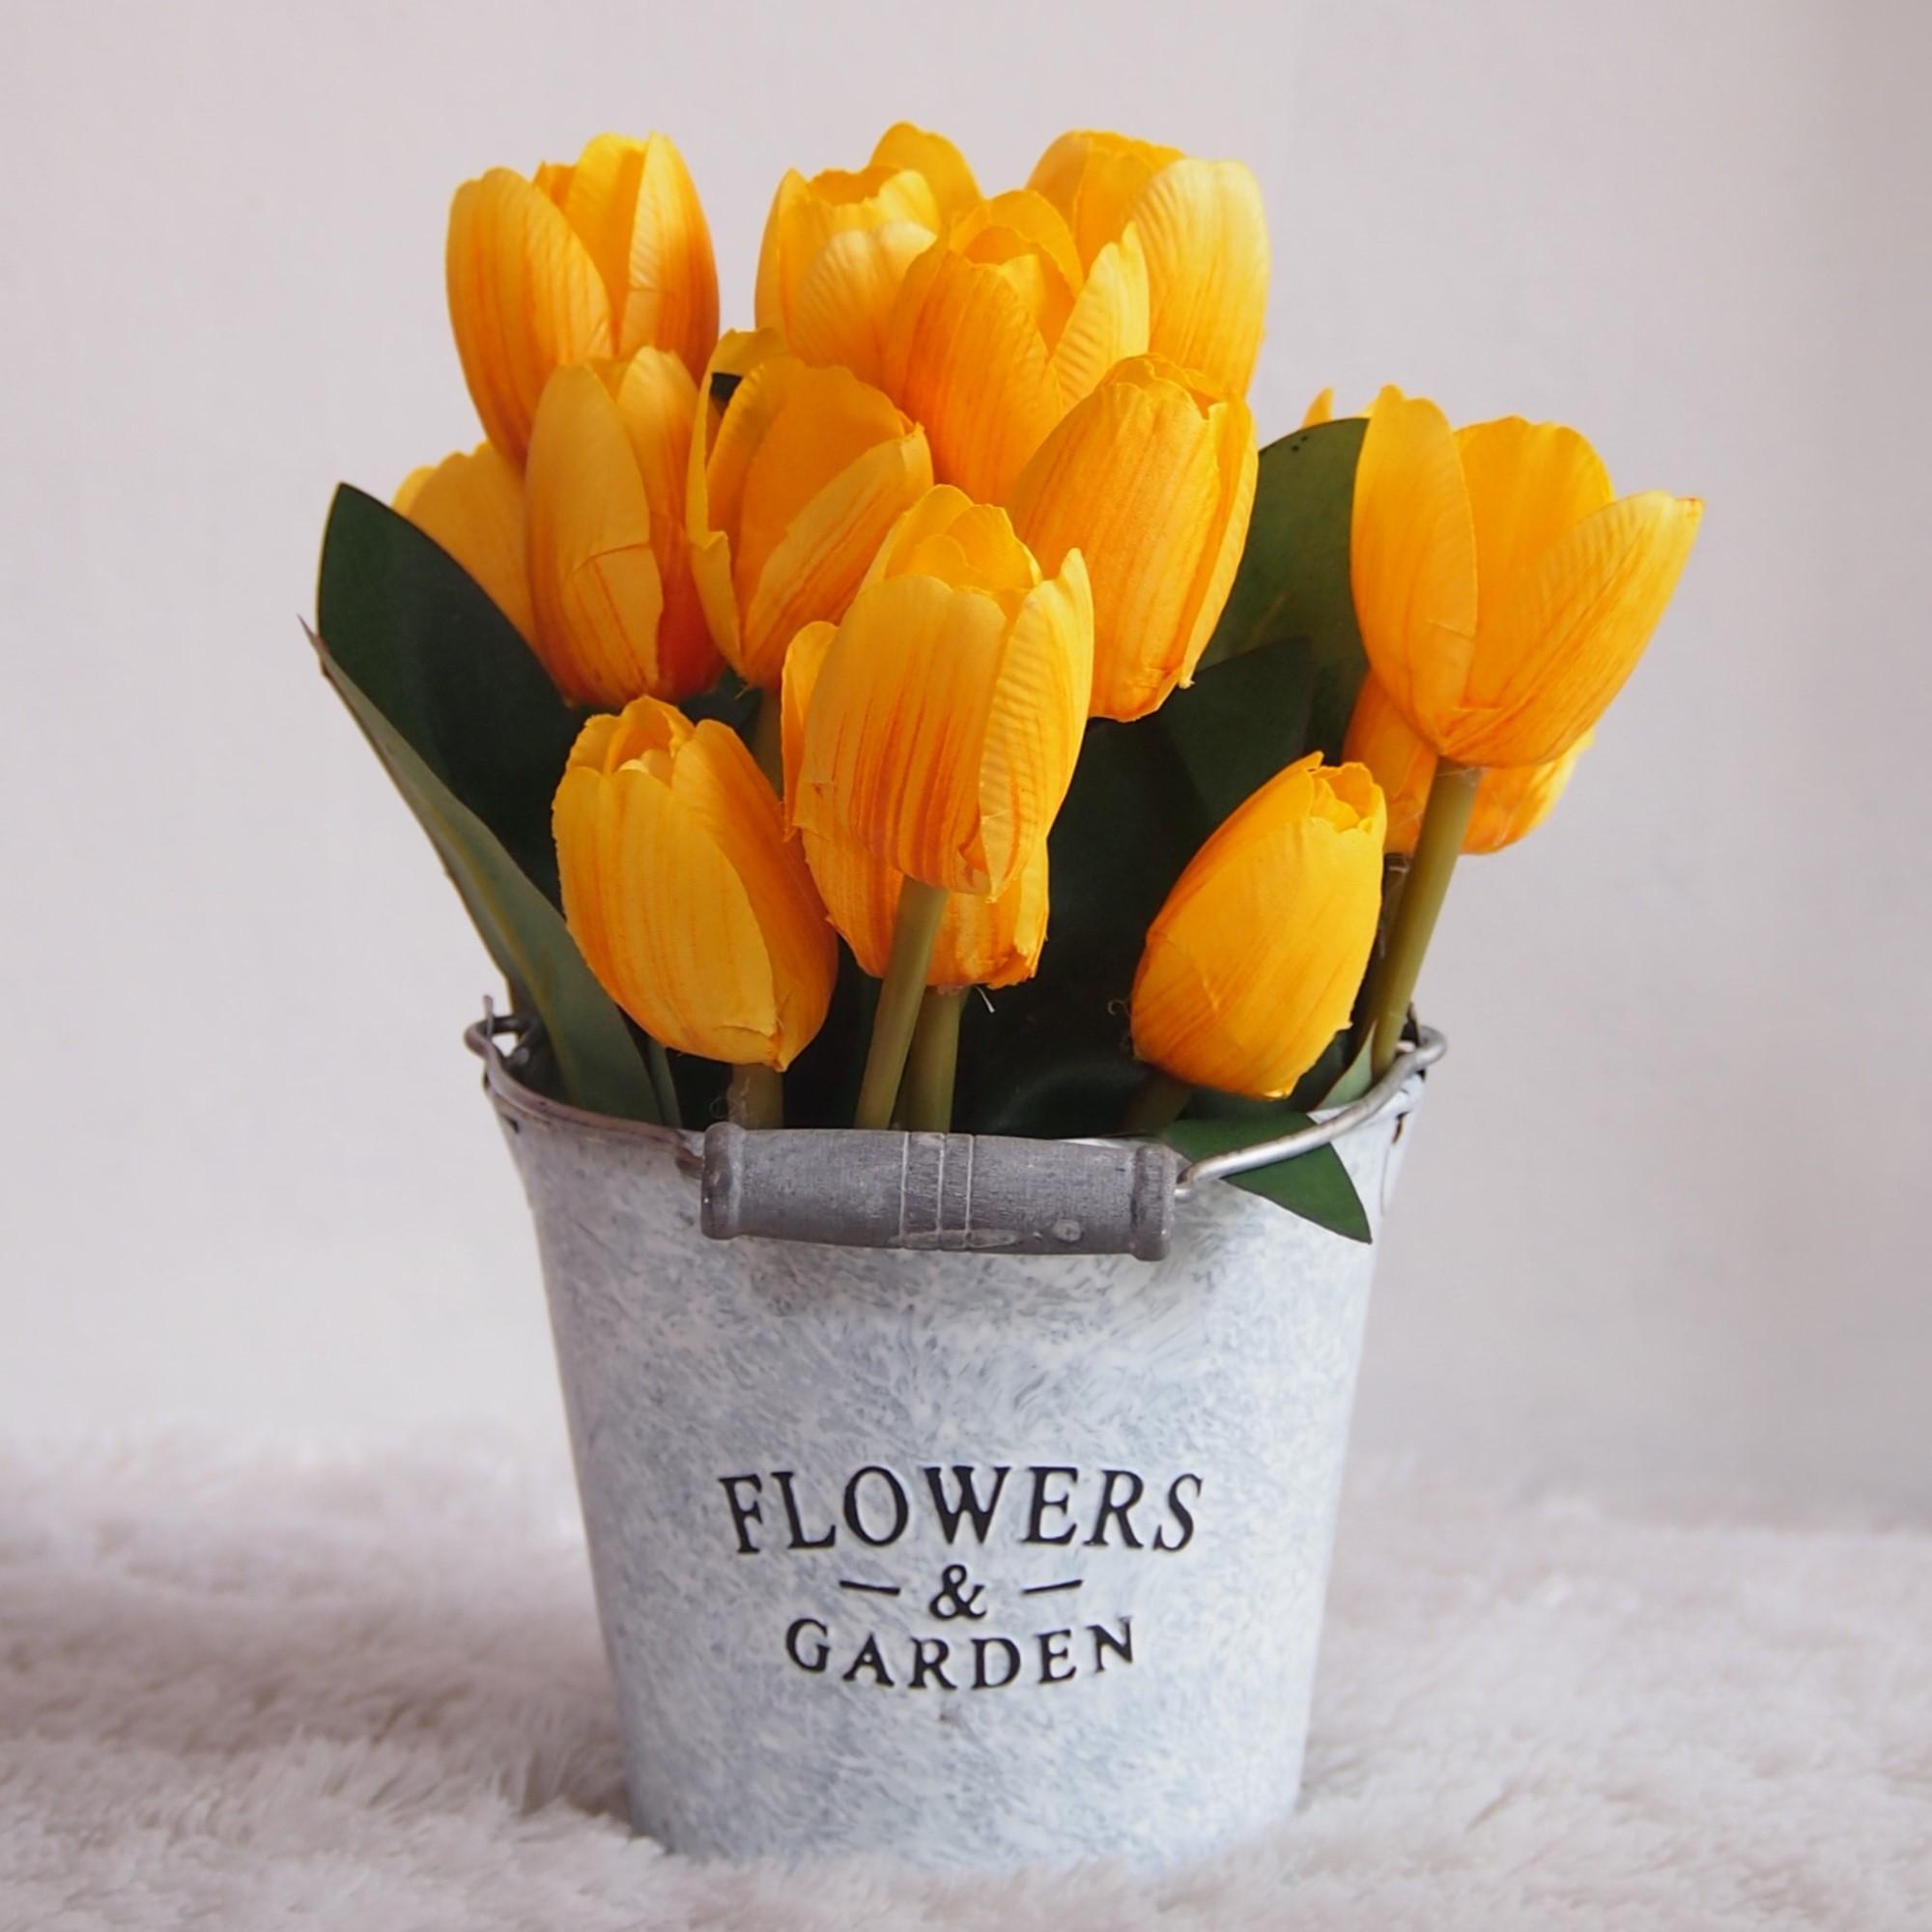 Bunga Pajangan - Bunga Hias Plastik - Bunga Tulip Kuning -Tanaman artifisial 8e8b970060